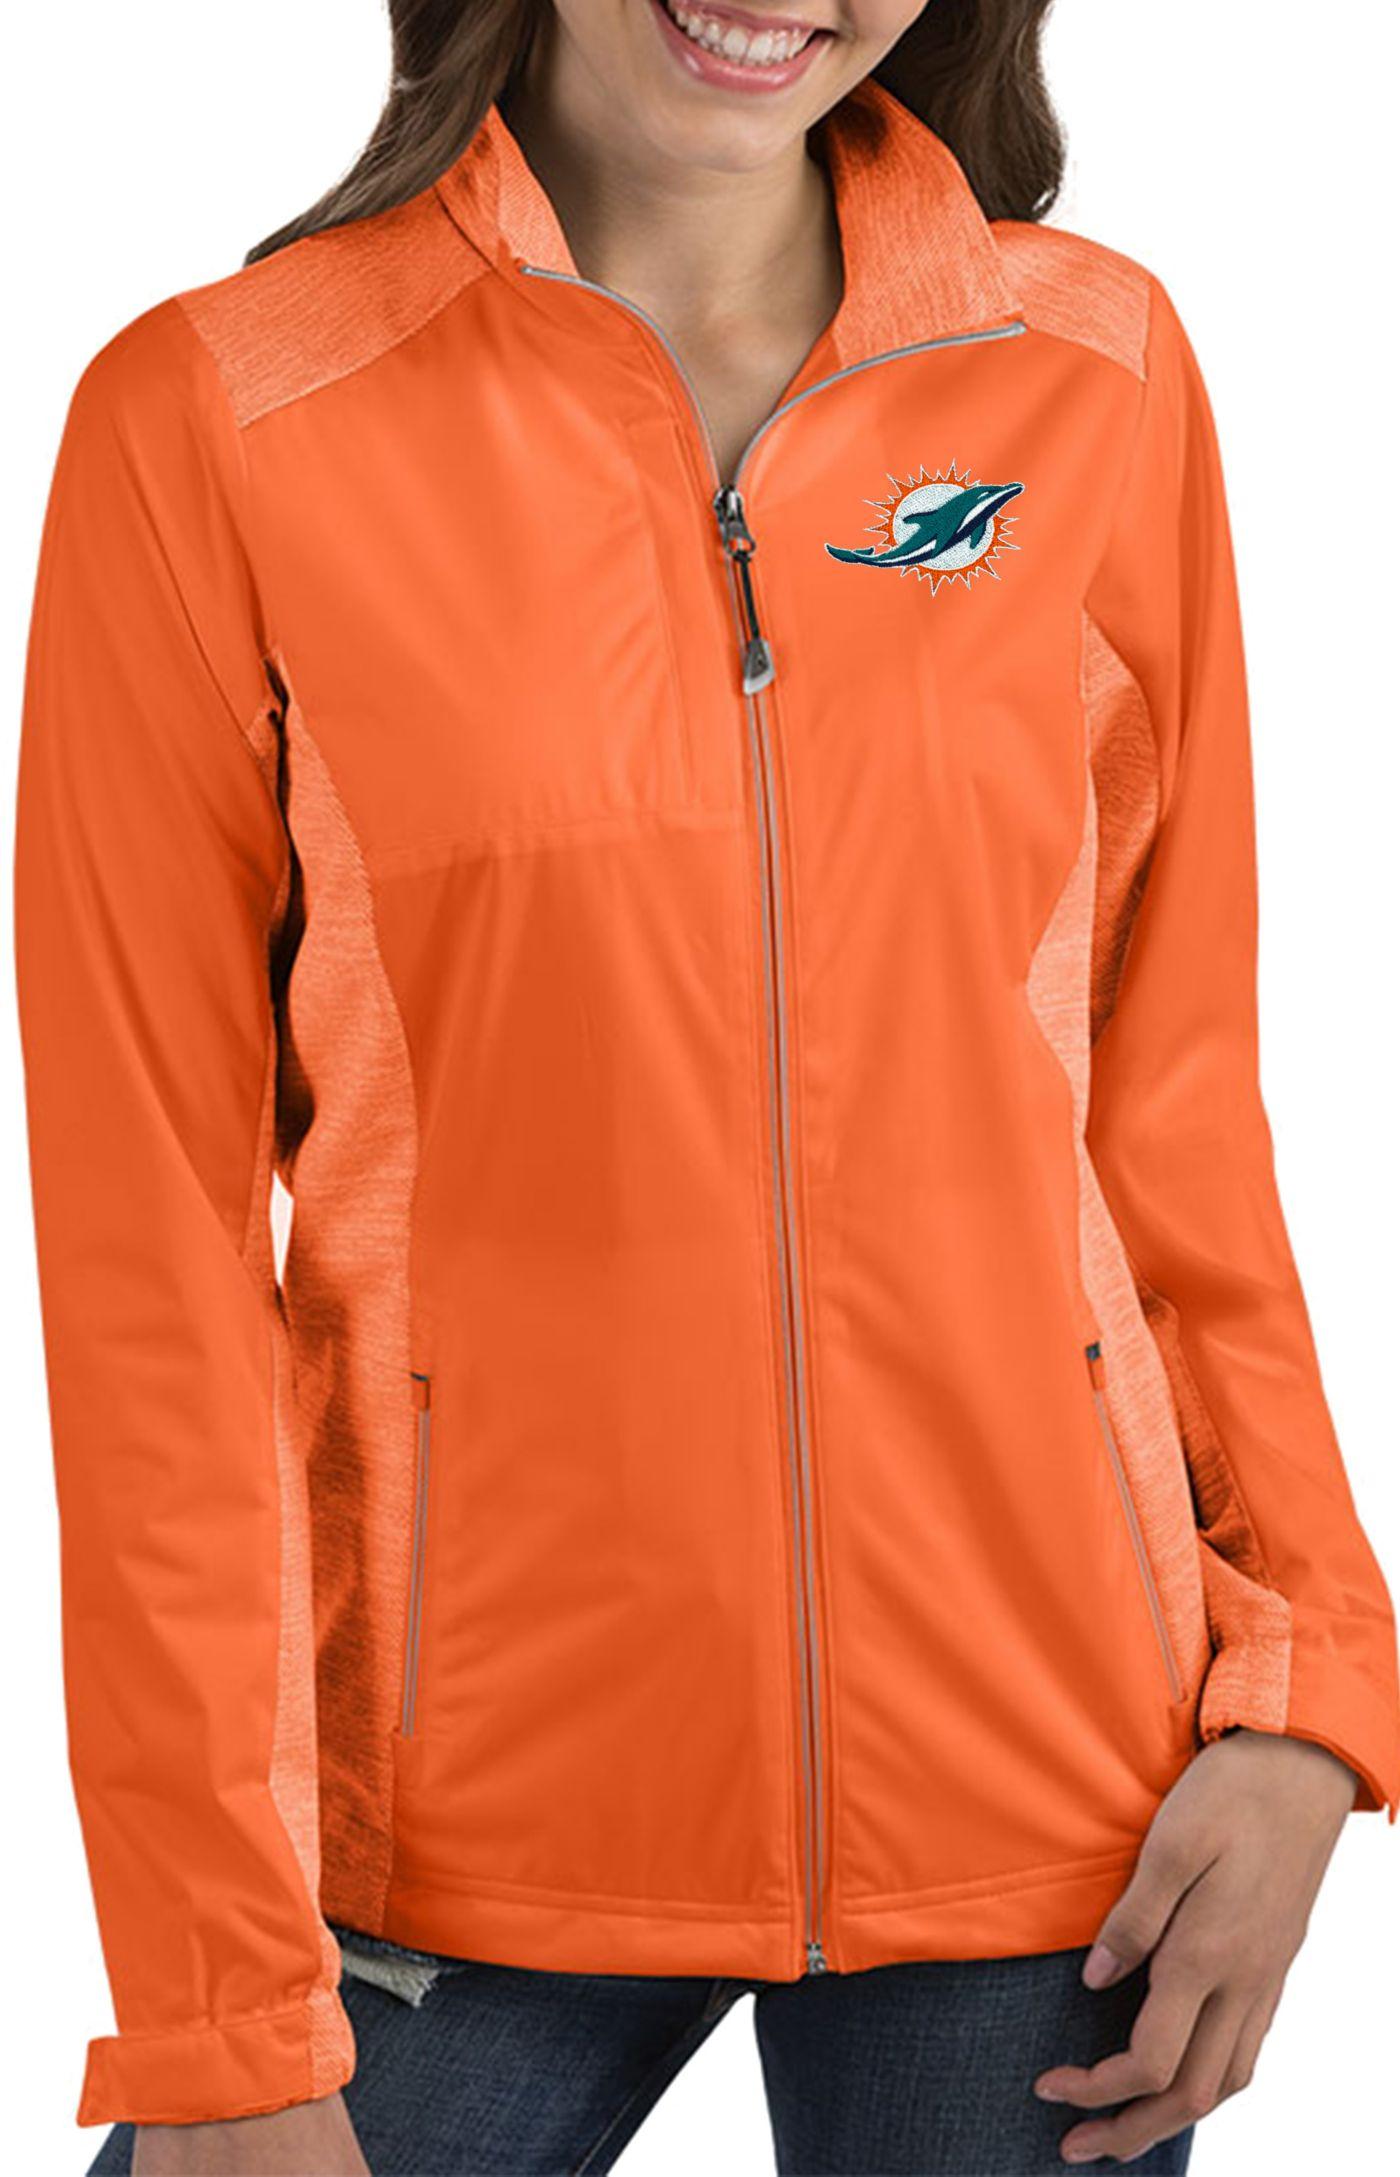 Antigua Women's Miami Dolphins Revolve Orange Full-Zip Jacket